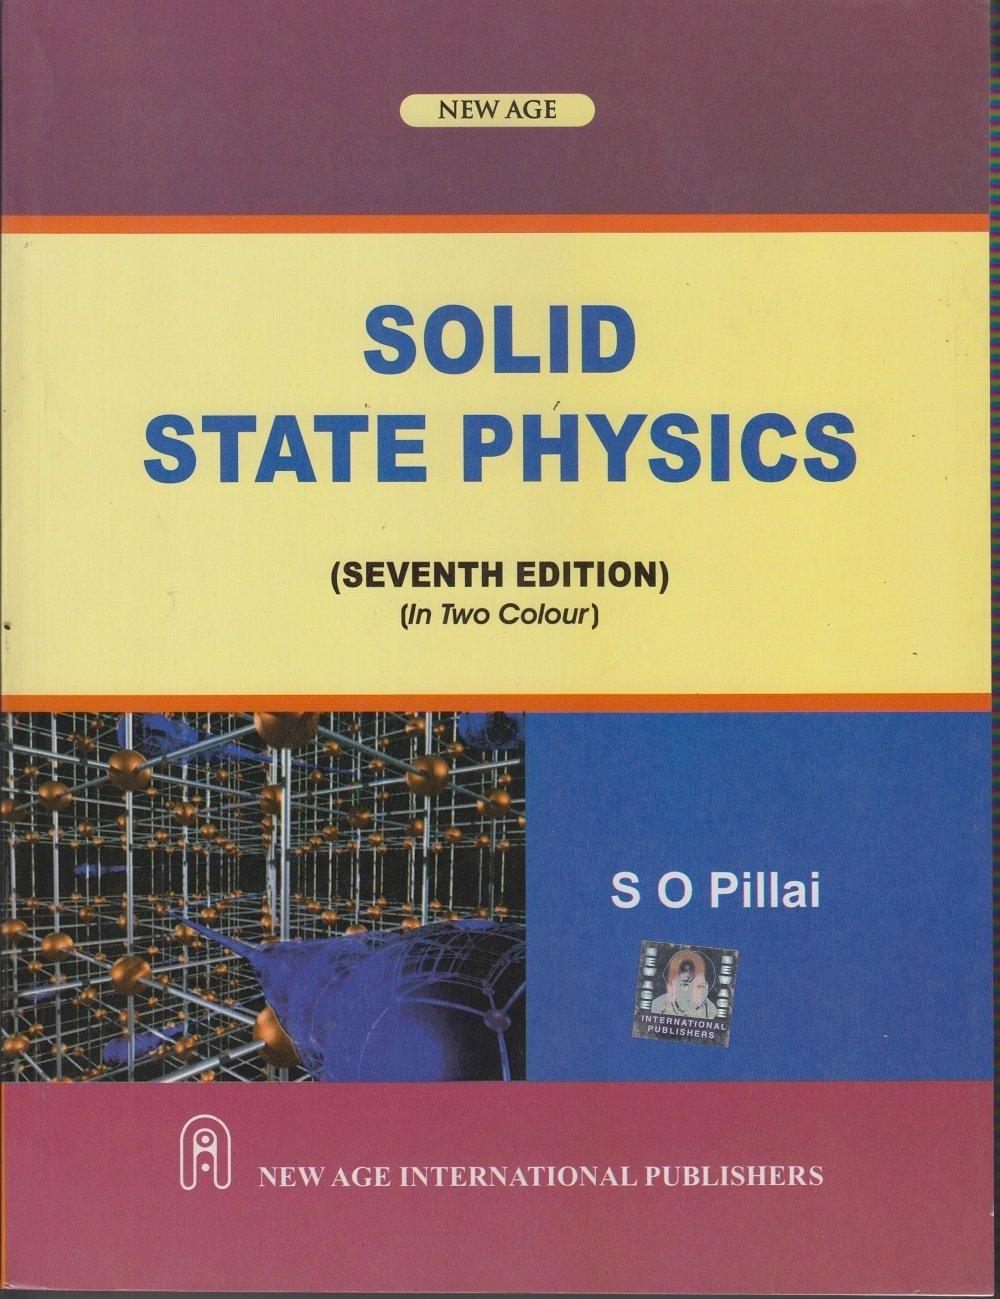 SOLID STATE PHYSICS SO PILLAI EPUB